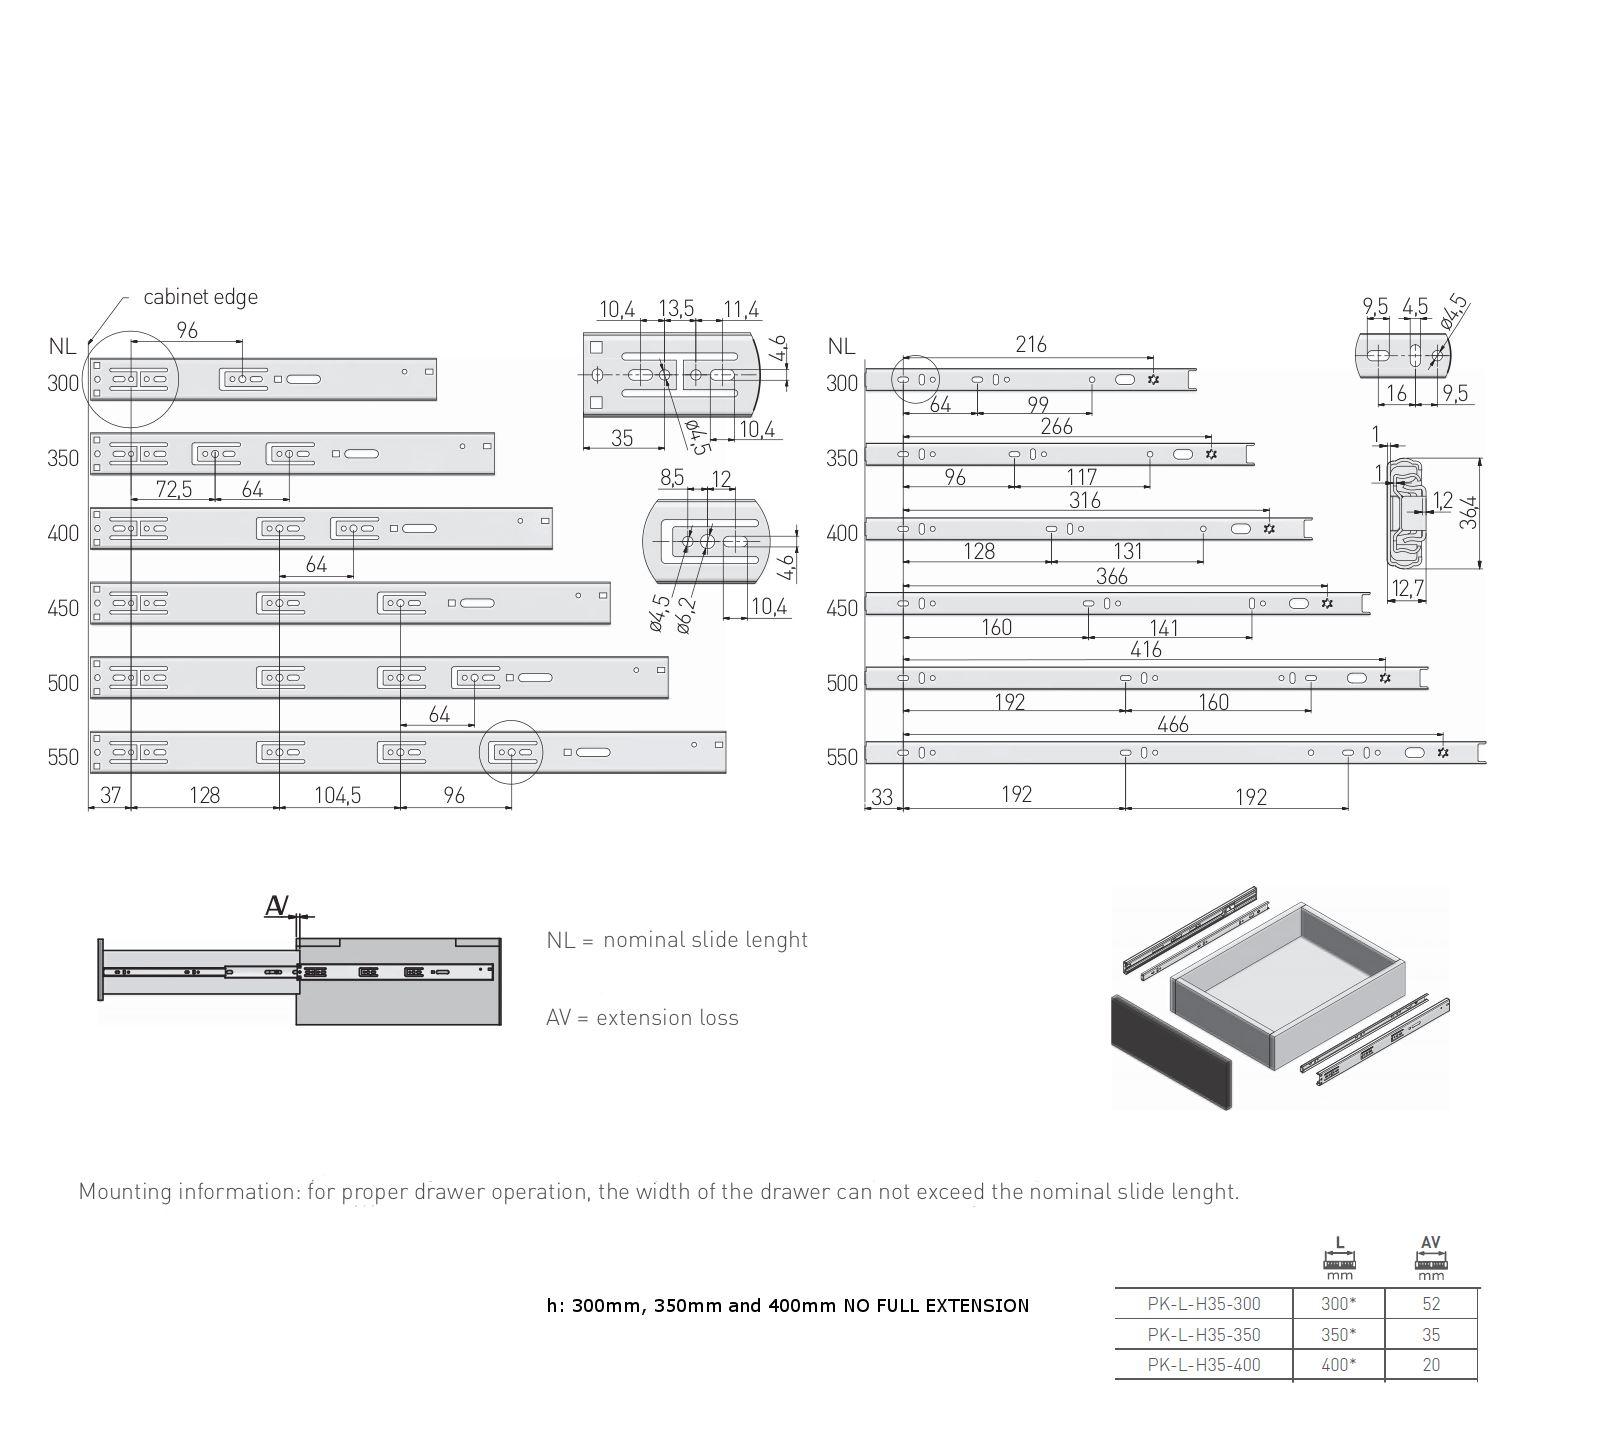 Bosch IXO V Batterie Clé à chocs 06039a800s 3.6 V 1.5ah LiIon ABQ Batterie Bitset